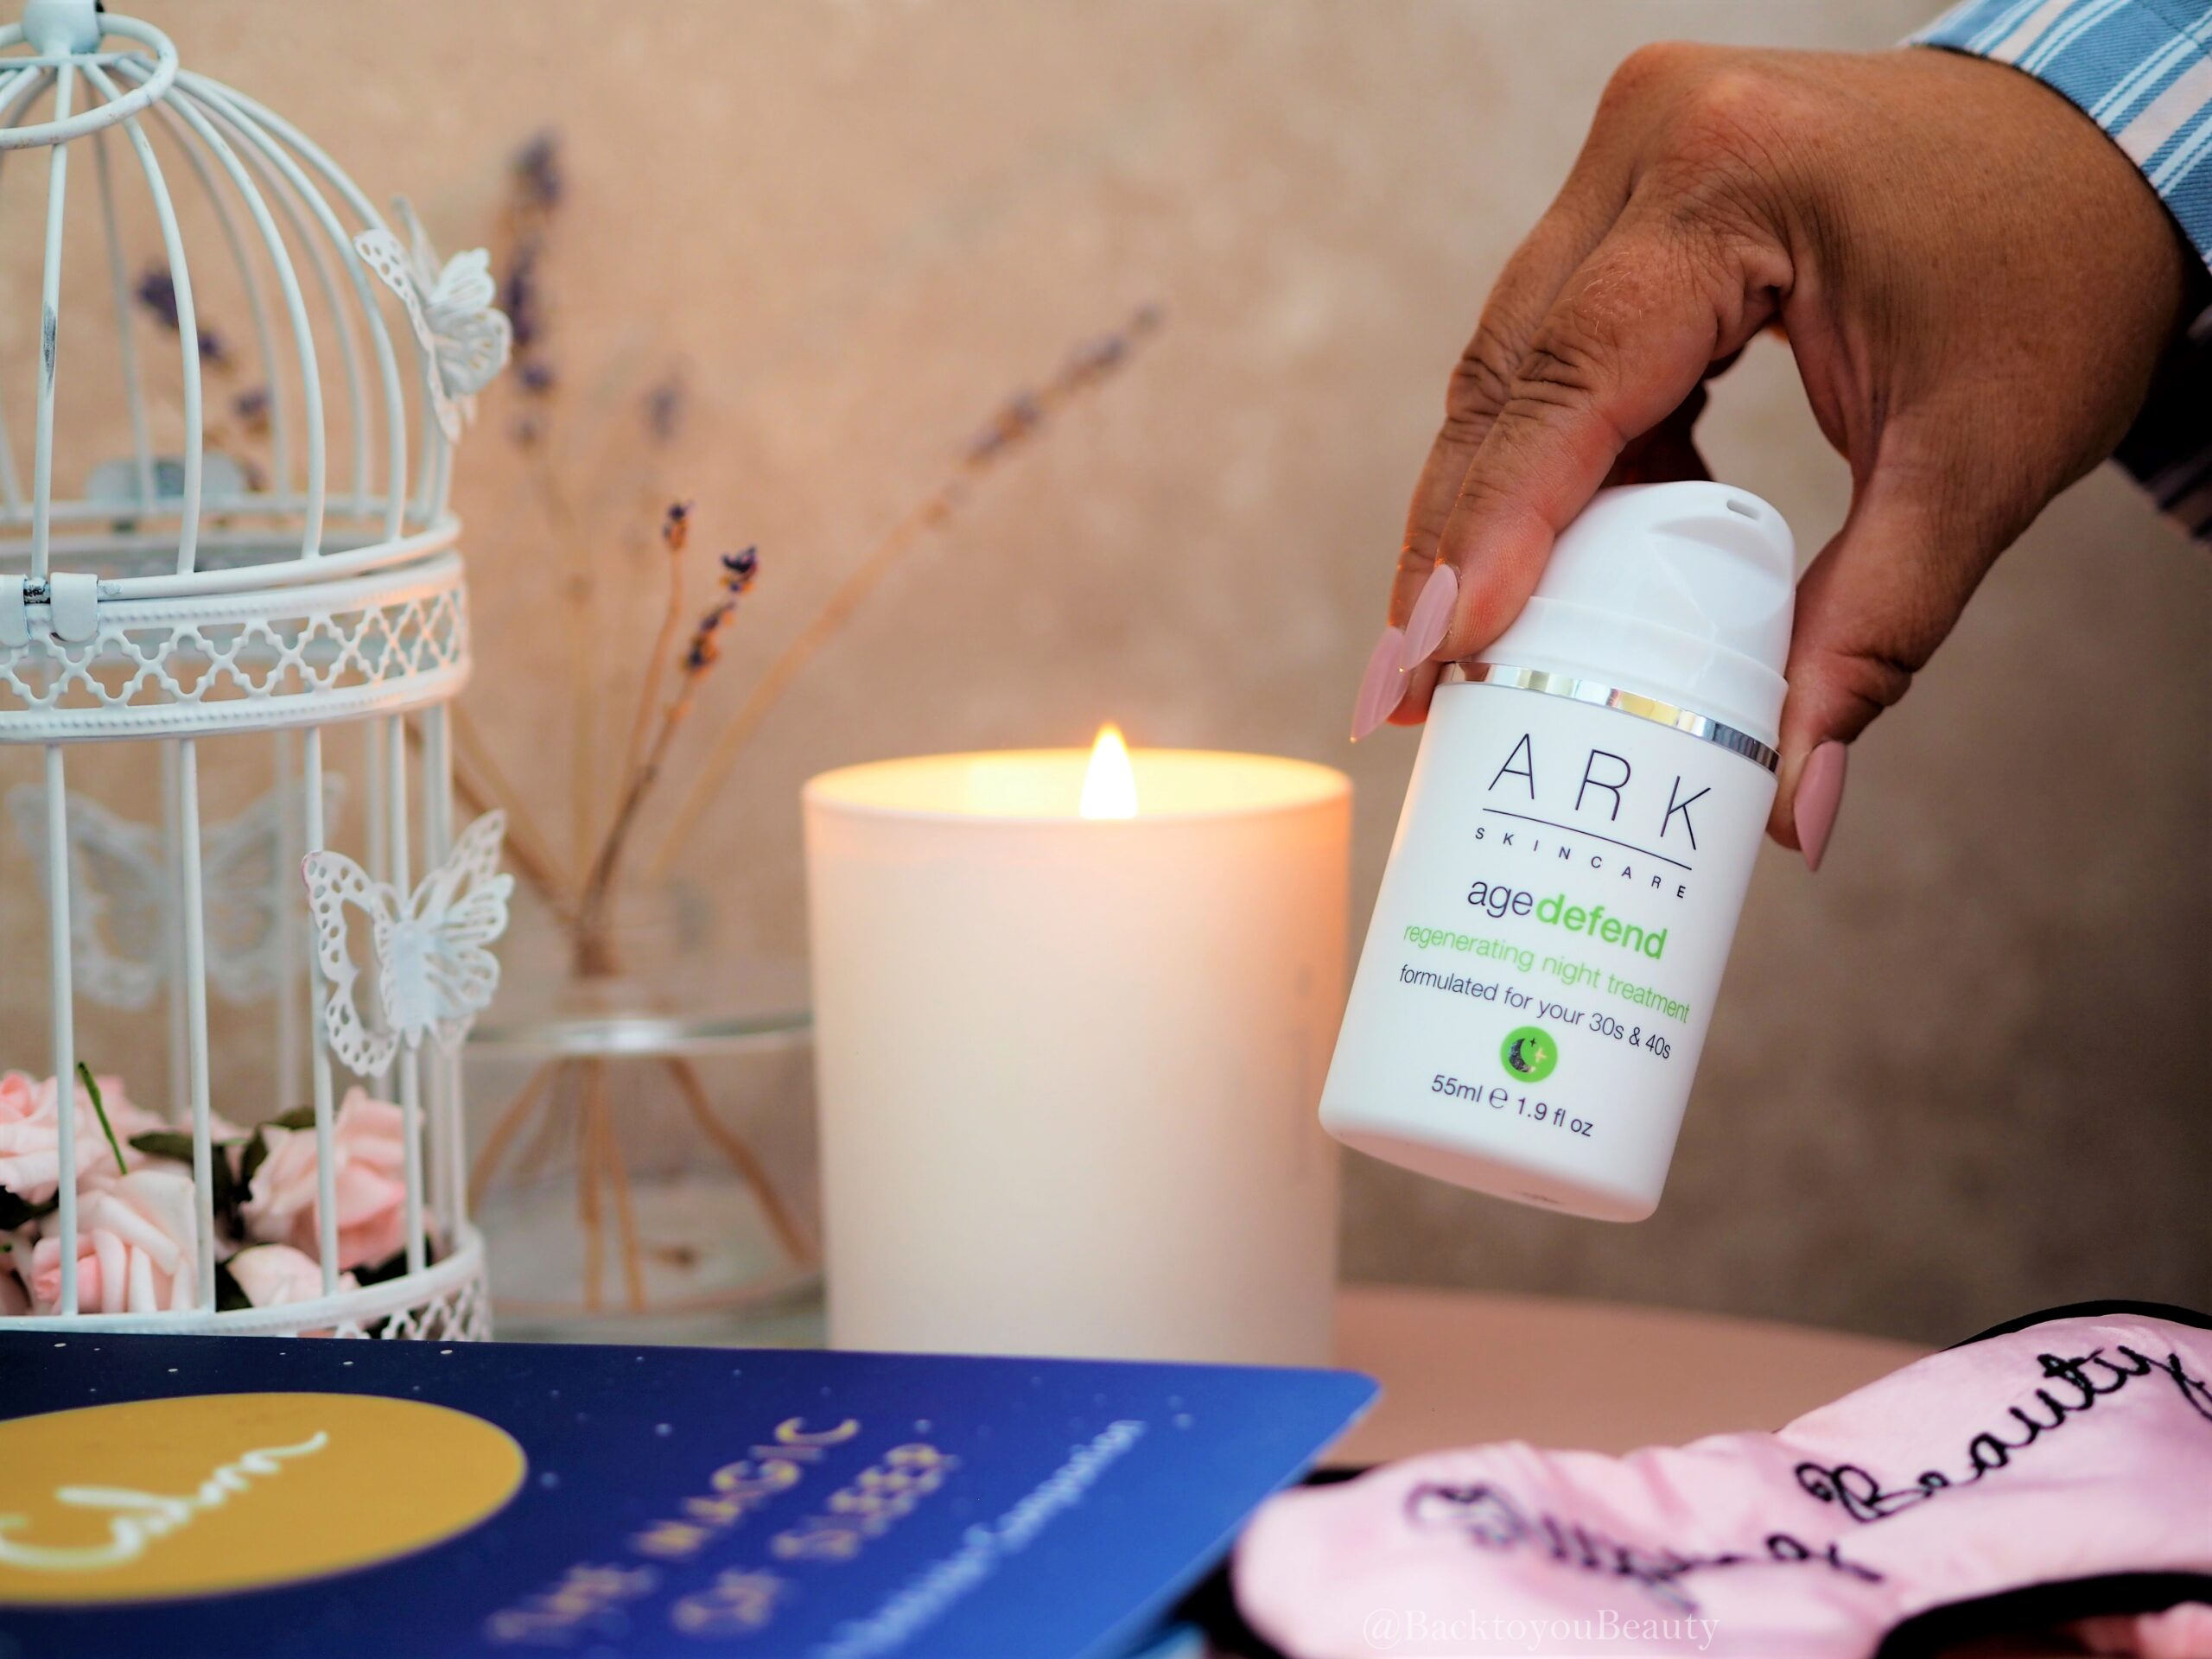 Ark Age Defend Regenerating Night Treatment